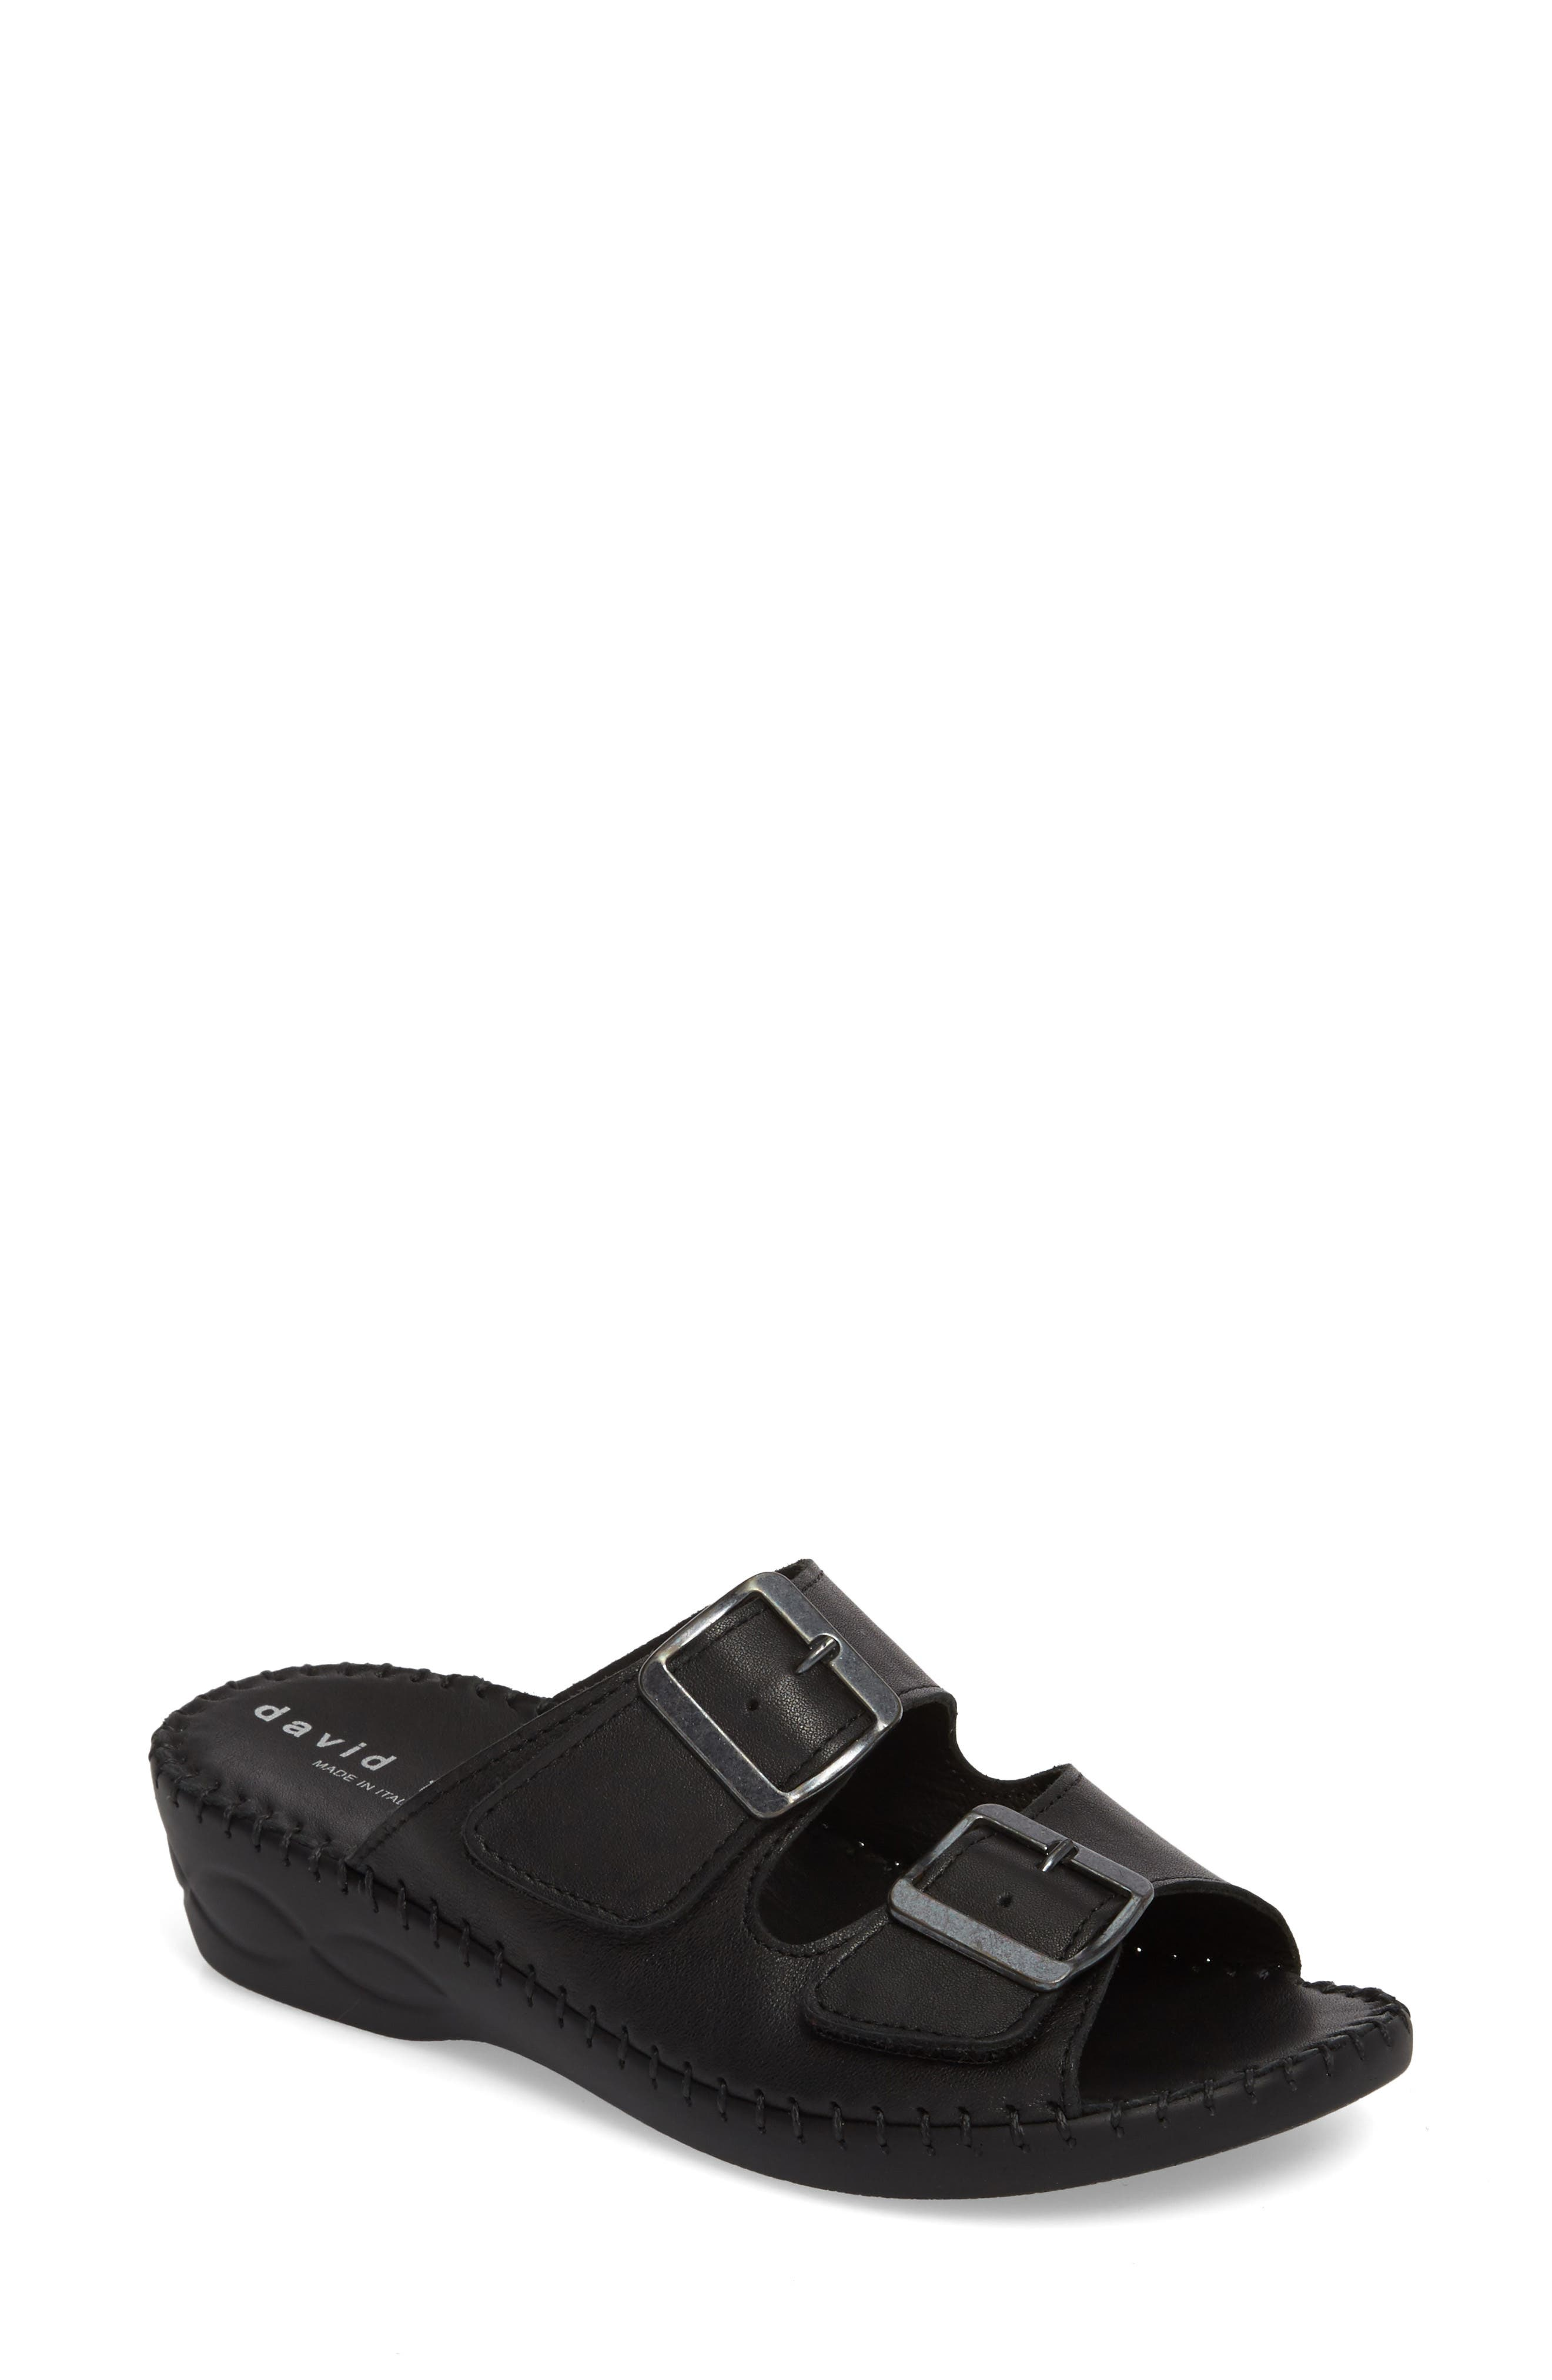 Sol Sandal,                             Main thumbnail 1, color,                             Black Leather